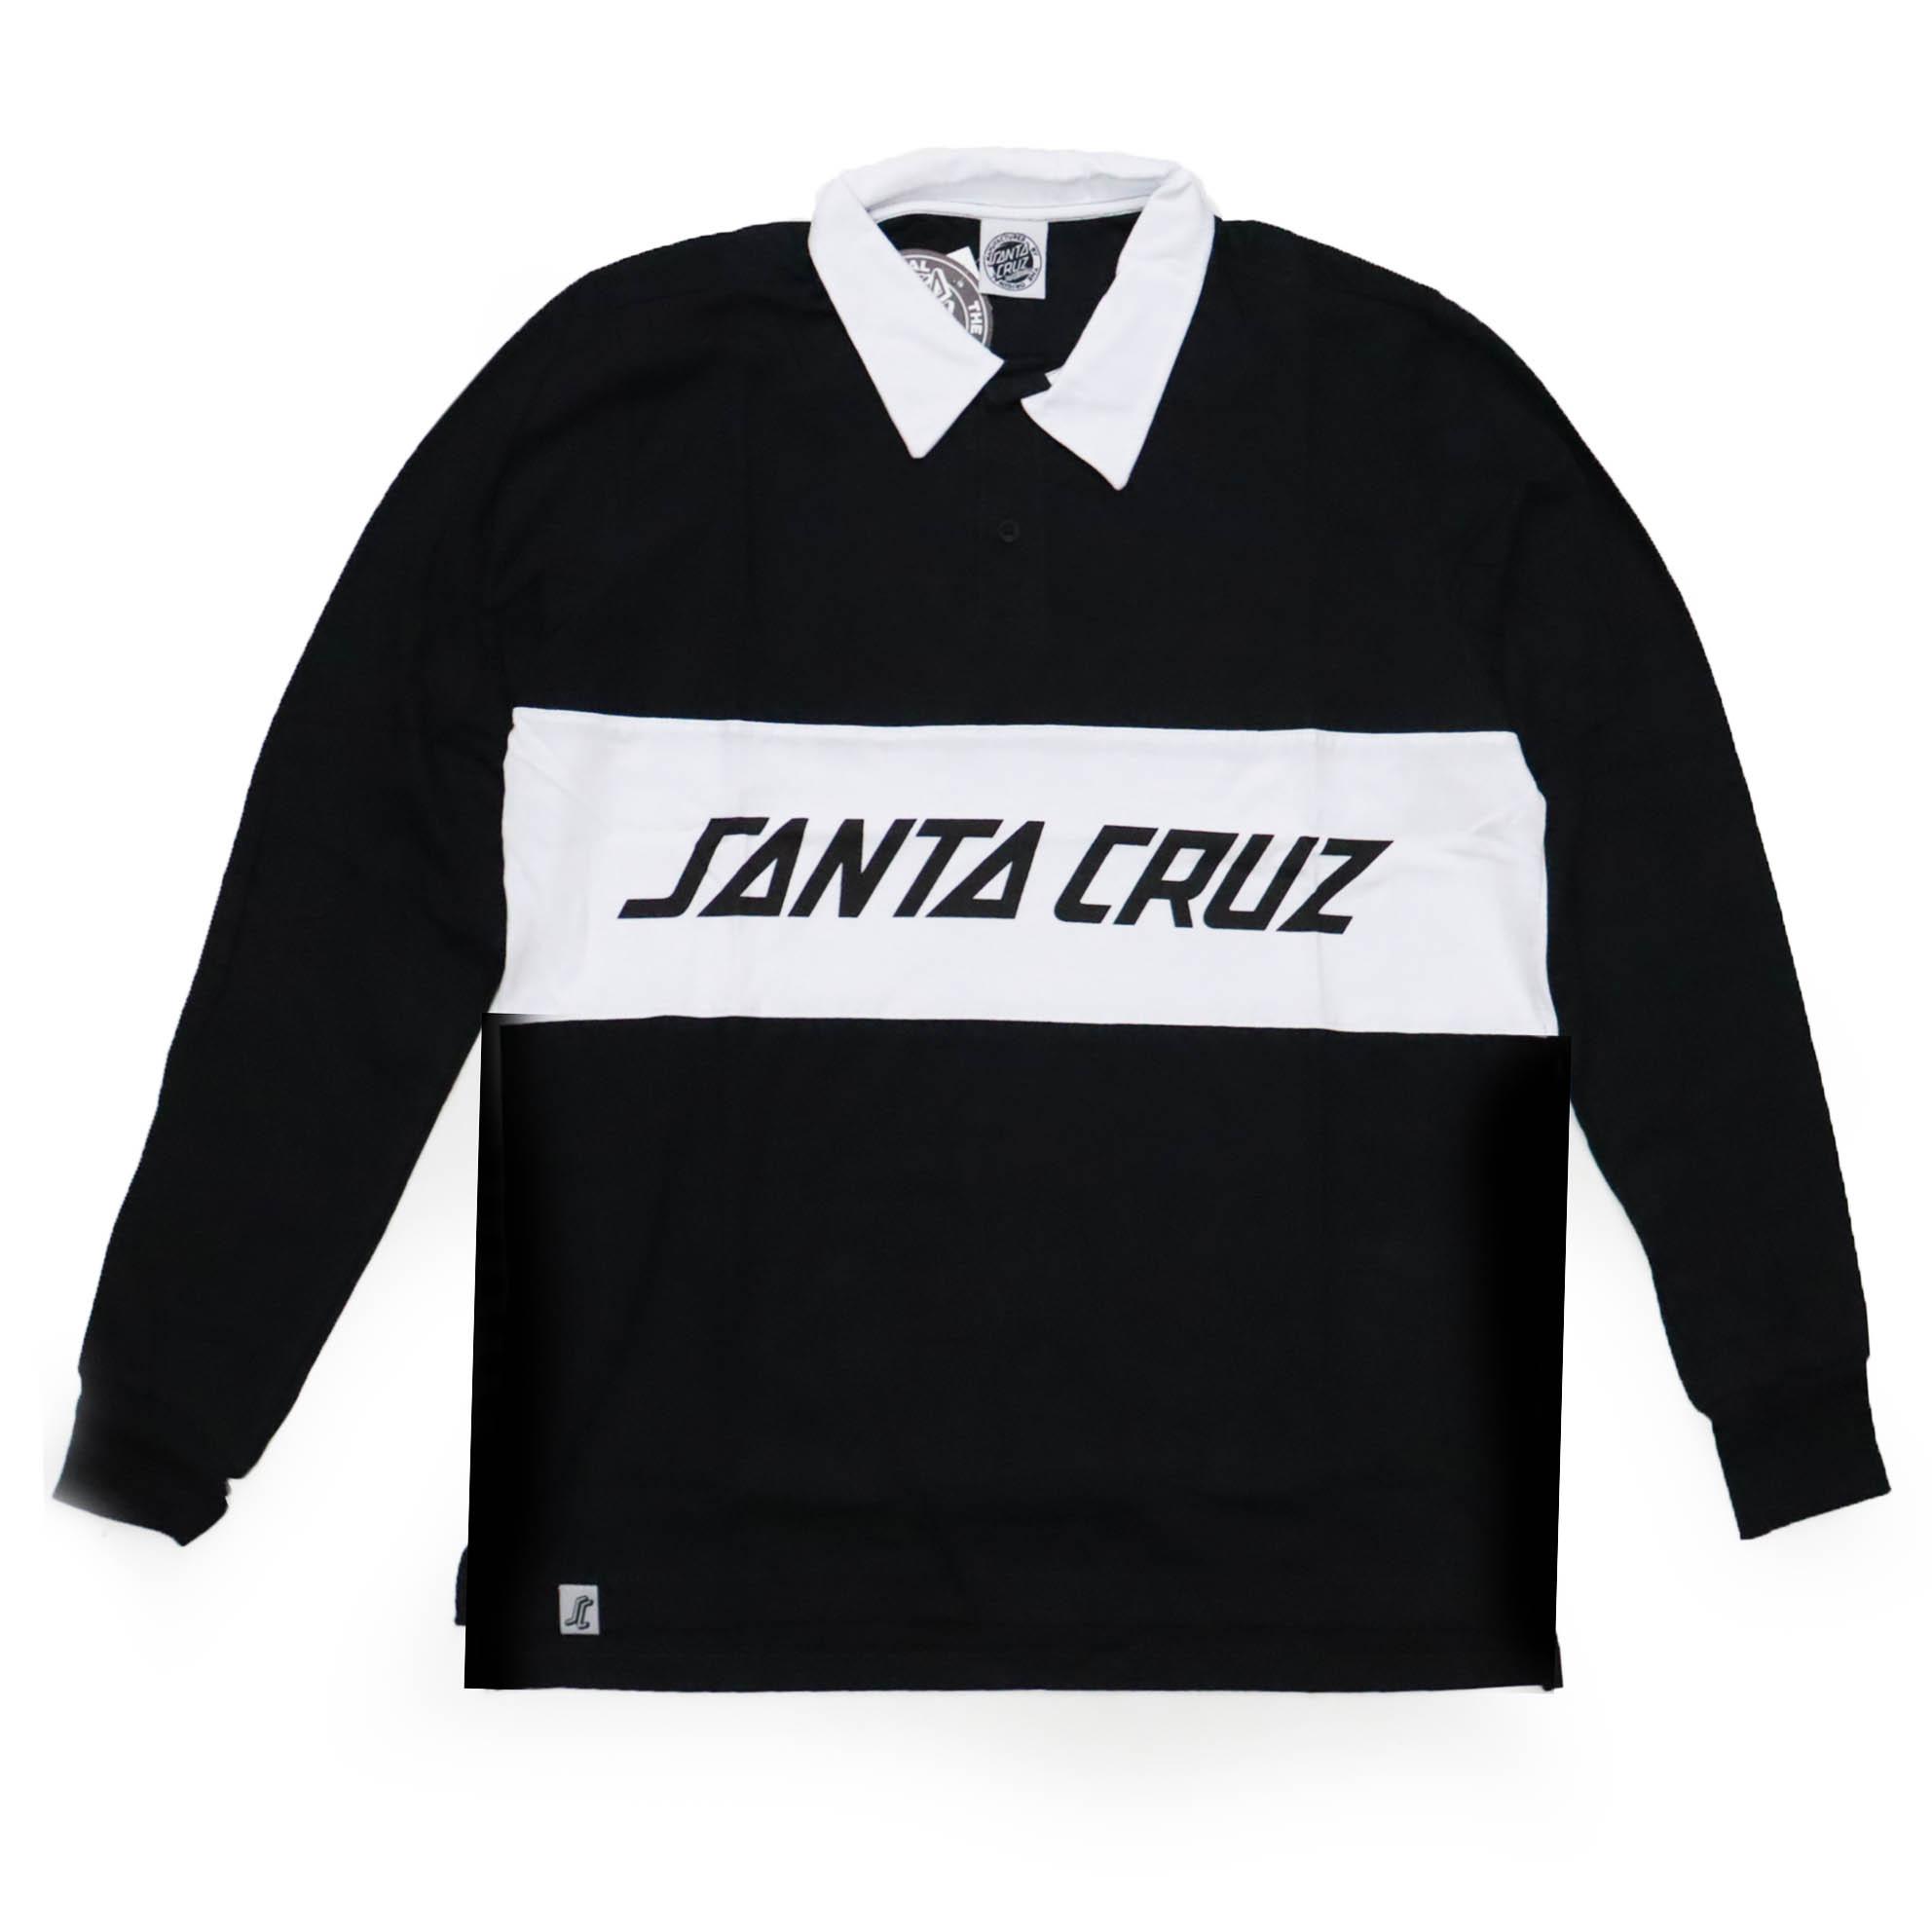 Camiseta Manga Longa Santa Cruz Striker - Preto/Branco